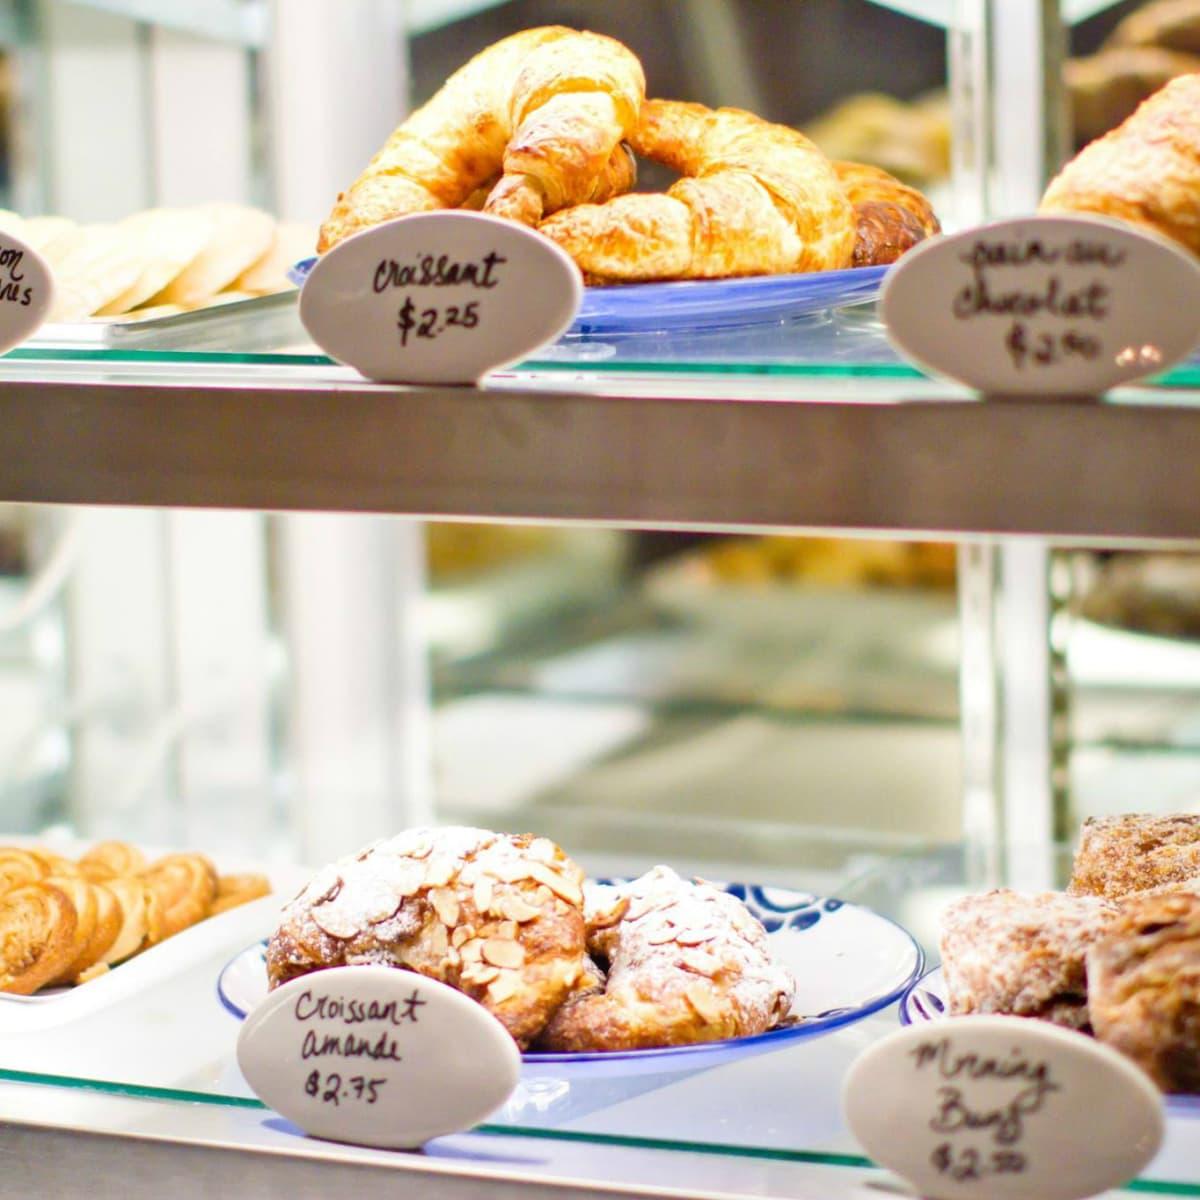 La Patisserie Austin bakery pastry case